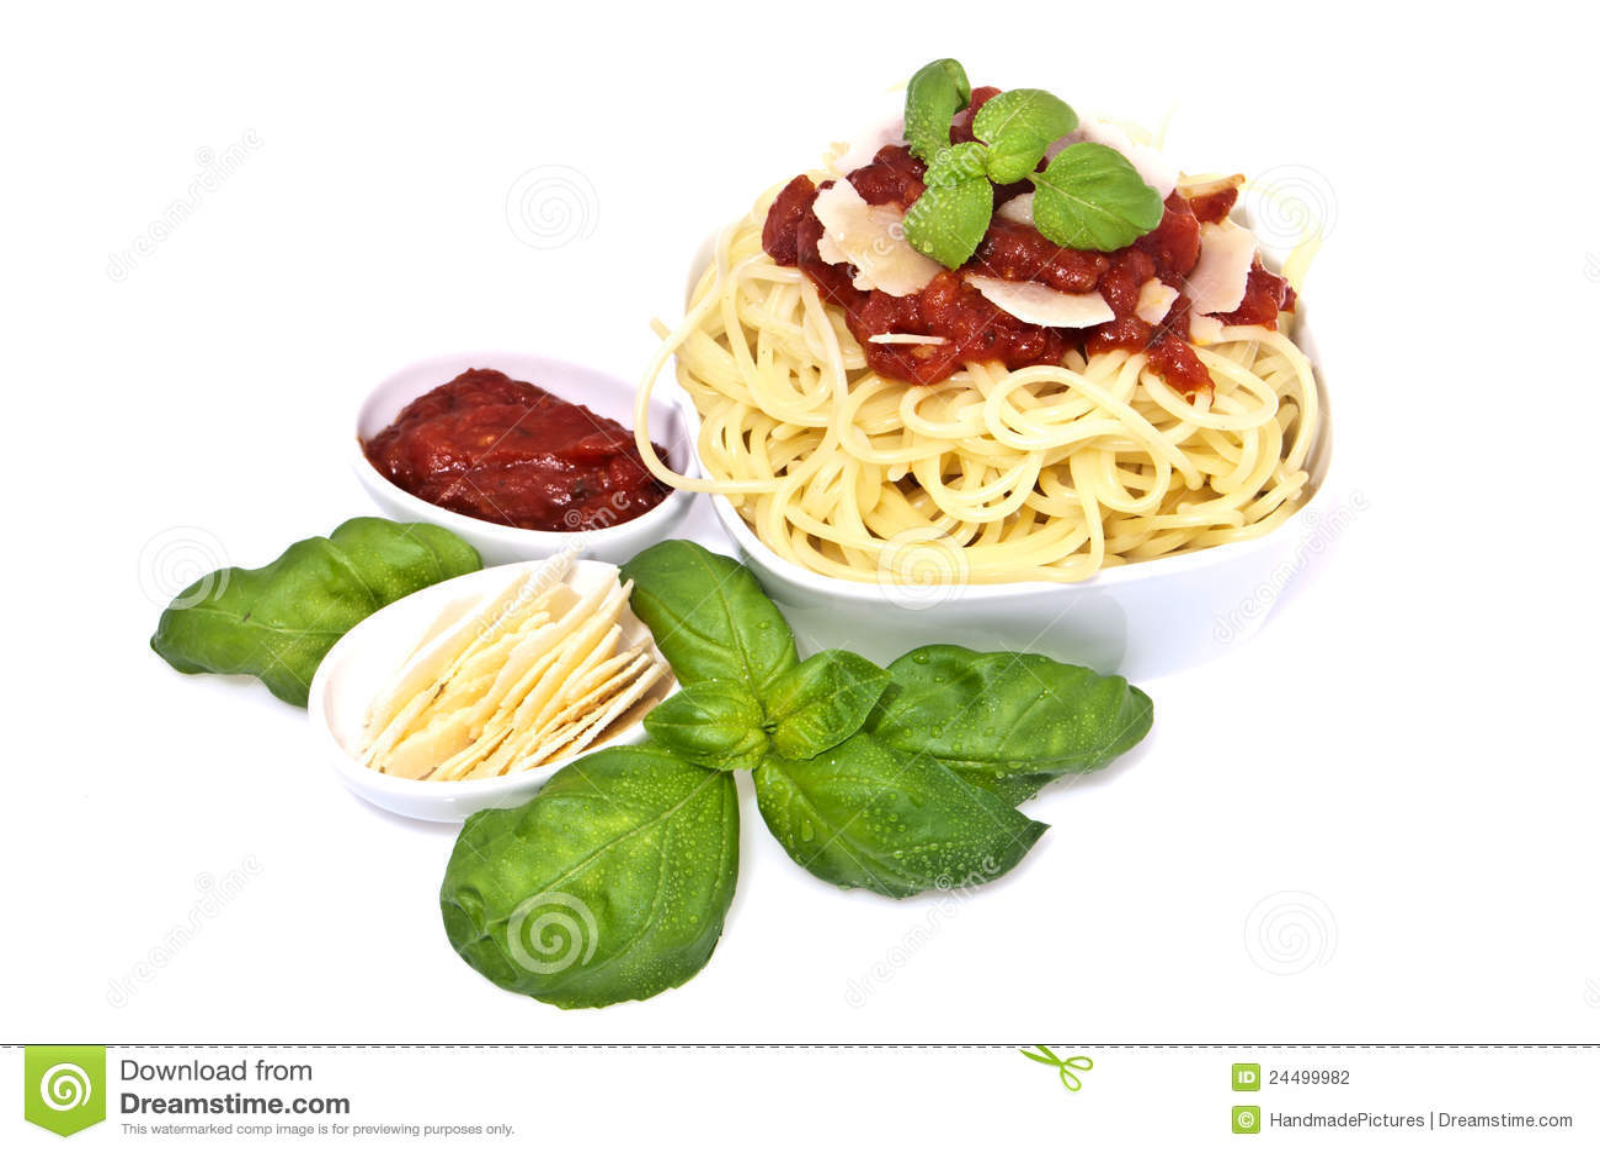 "Spaghetti"" With Tomato Sauce And Parmesan Cheese Recipe — Dishmaps"